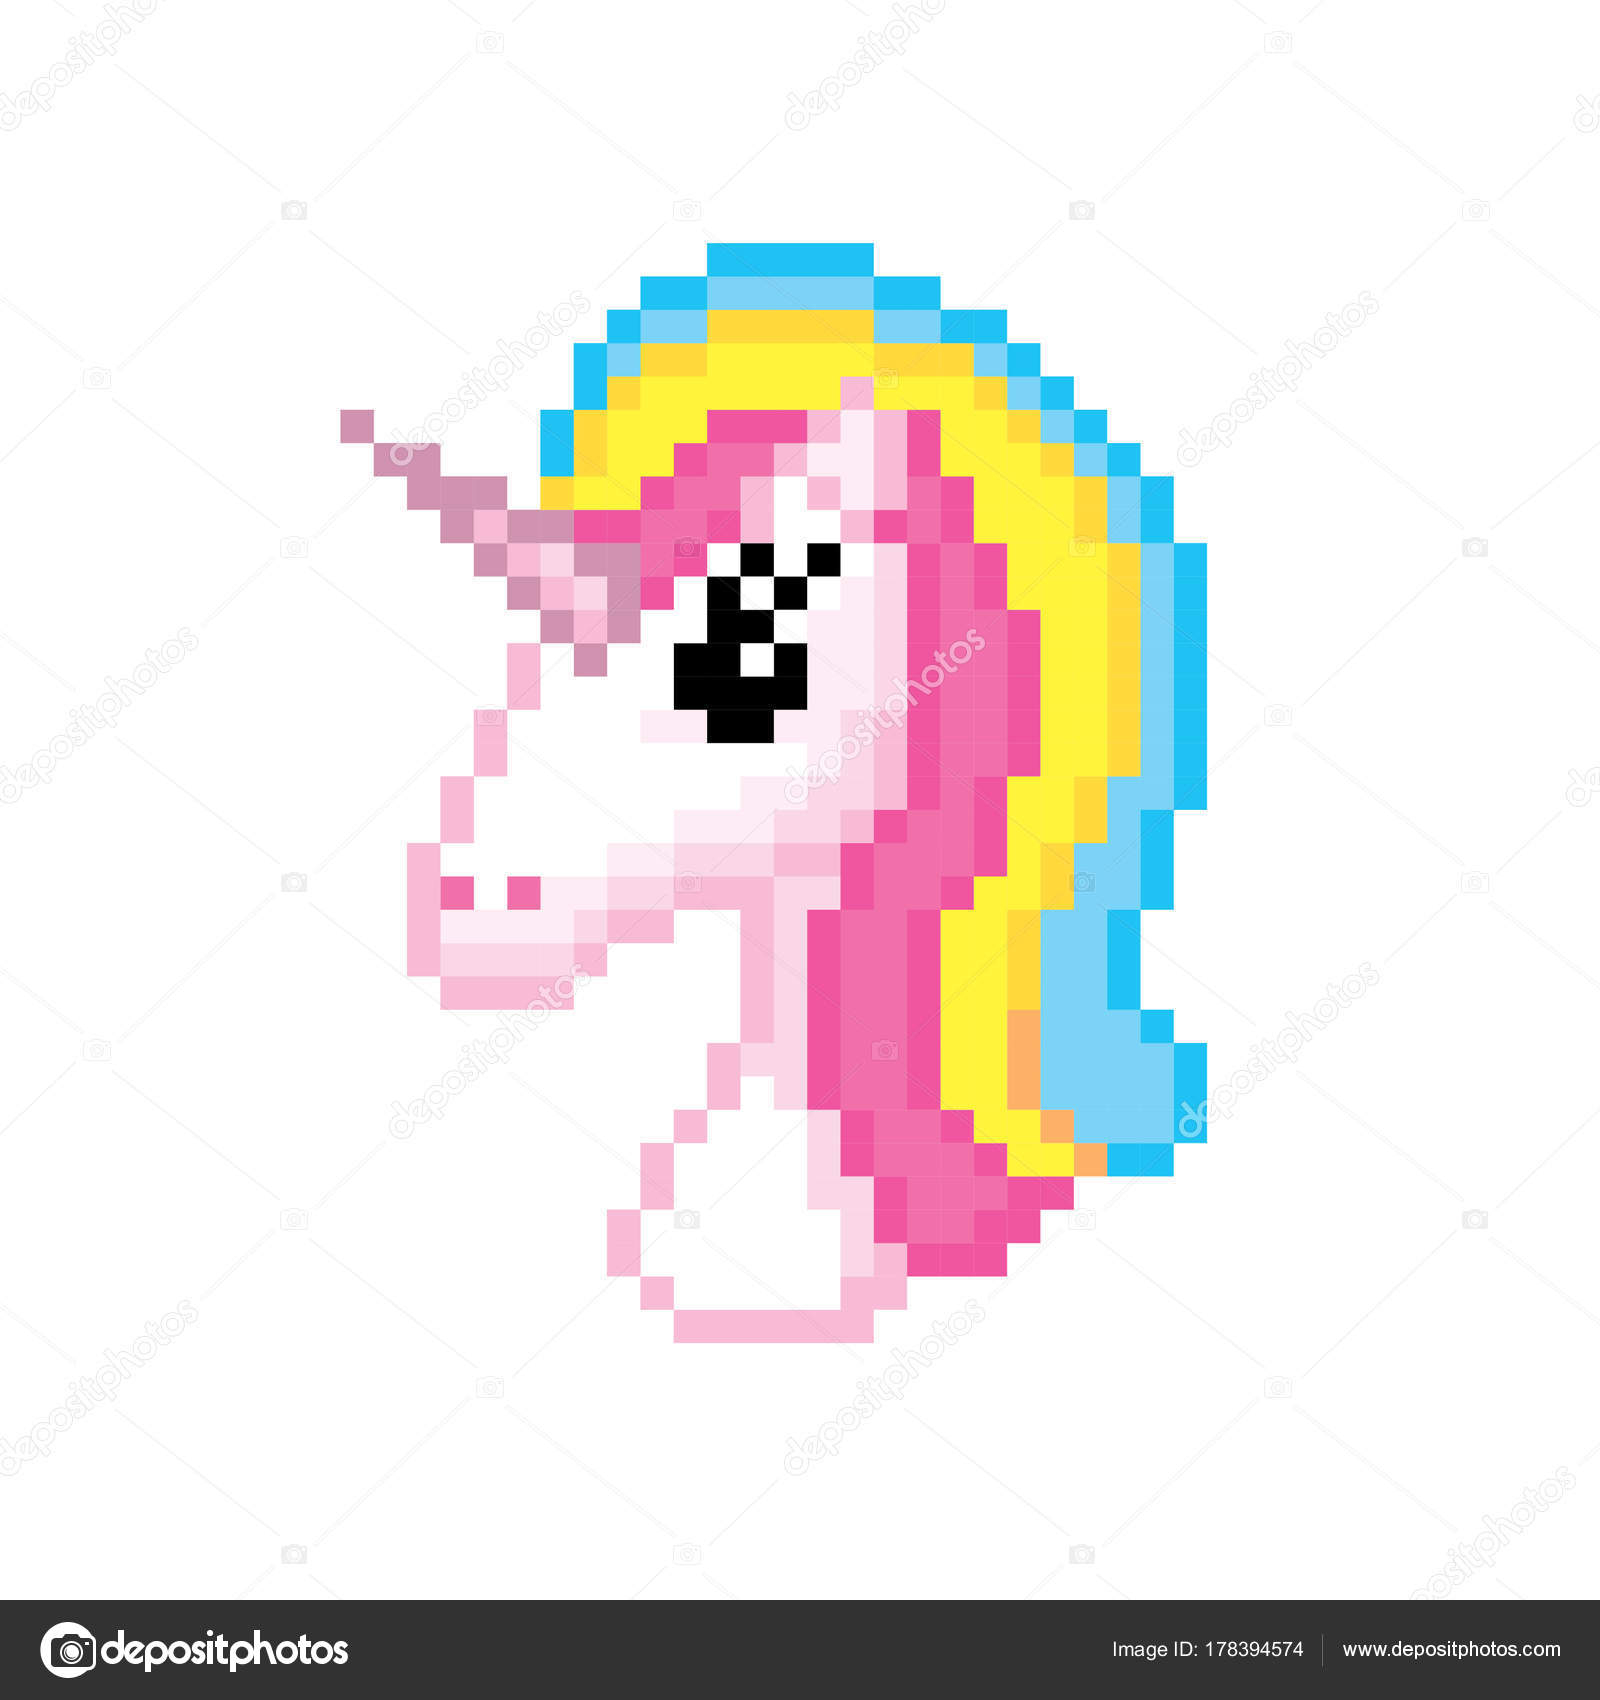 Unicorn Icon Pixel Art Old School Computer Graphic Style